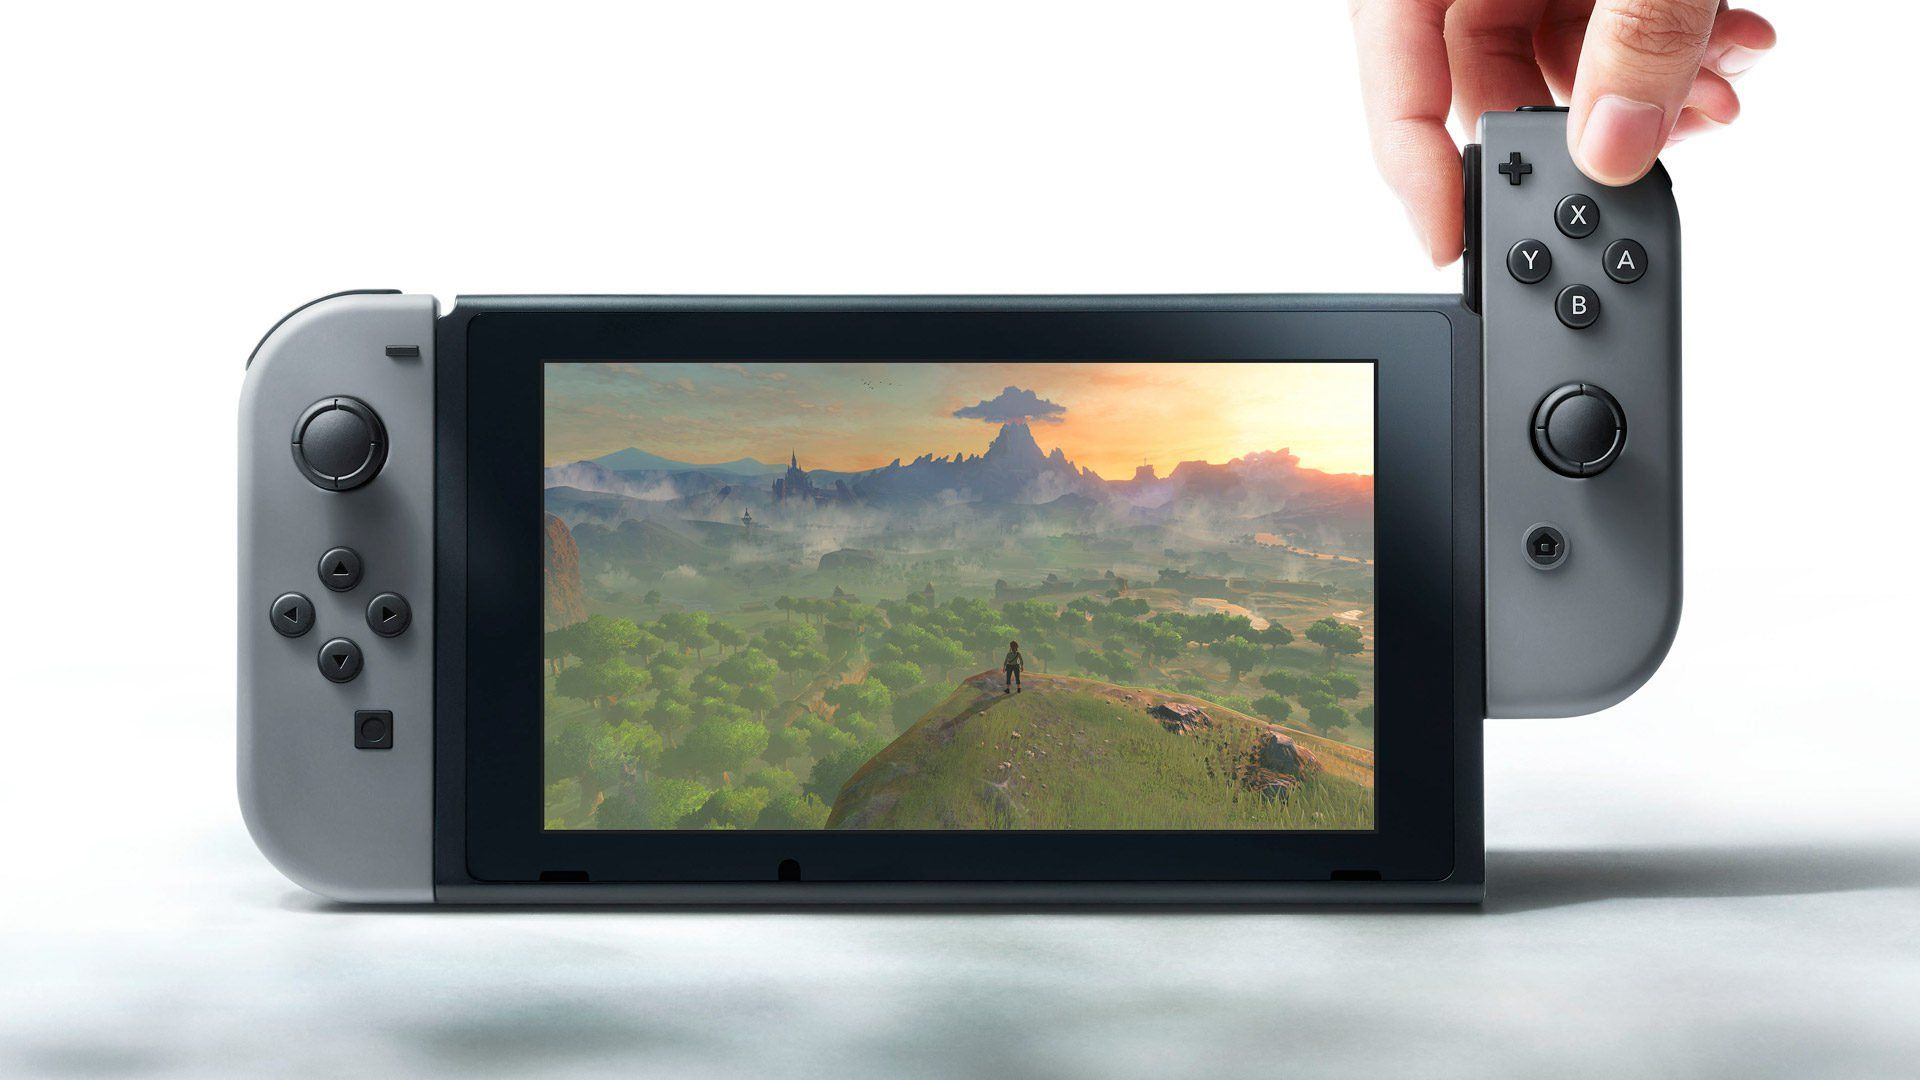 Nintendo Switch Save Data Storage Internal Only, microSD Not Sharable - http://techraptor.net/content/nintendo-switch-save-data-storage-internal-microsd-not-sharable   Gaming, Gaming News